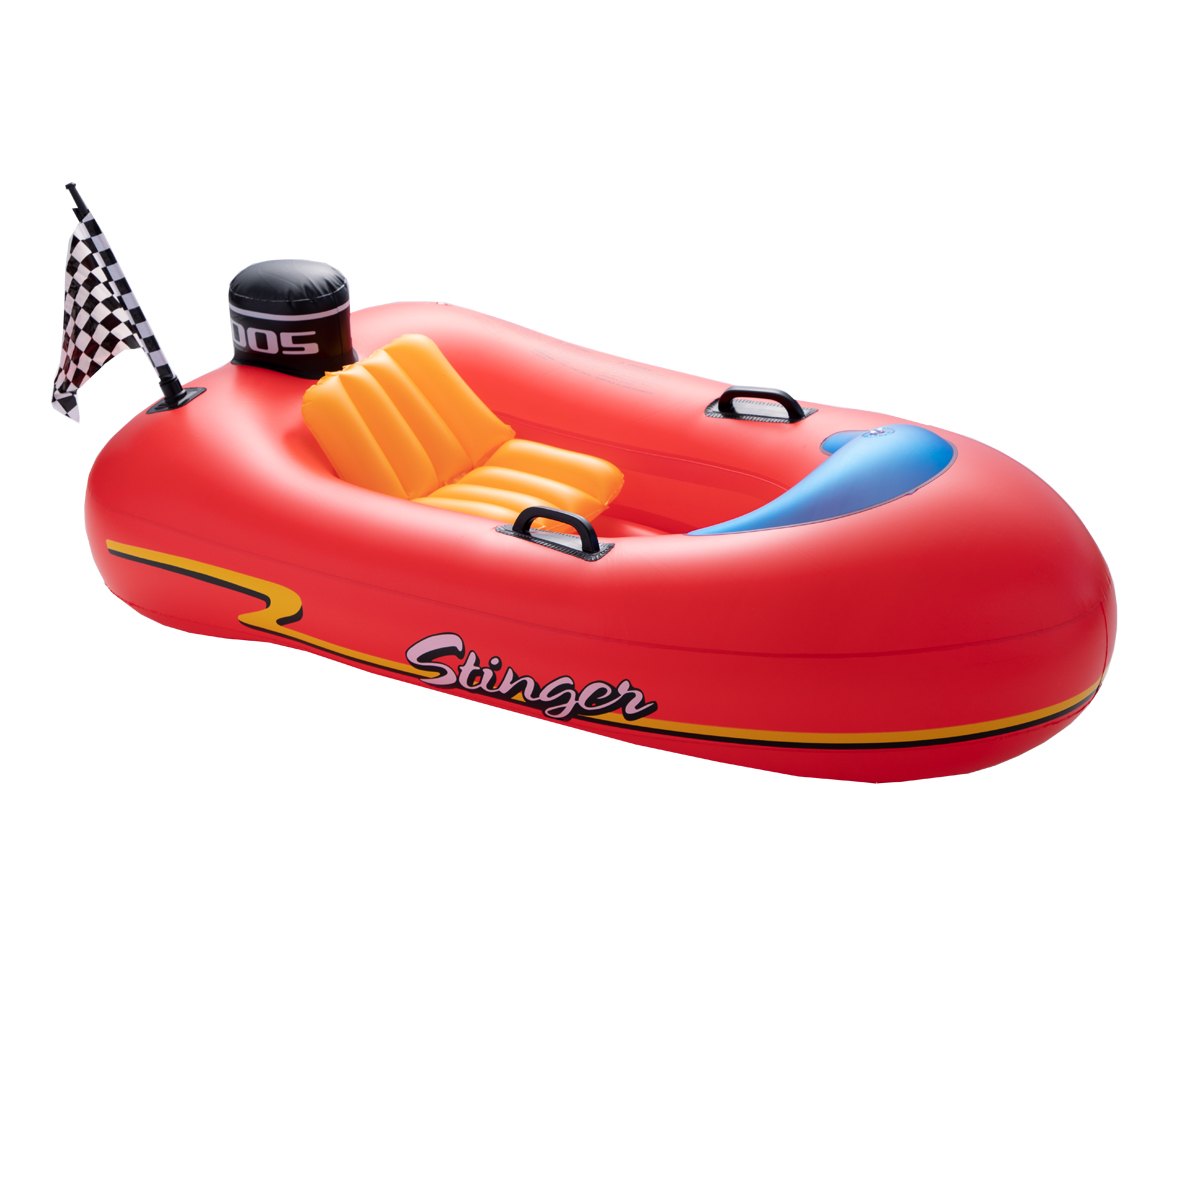 Sting Ray Boat